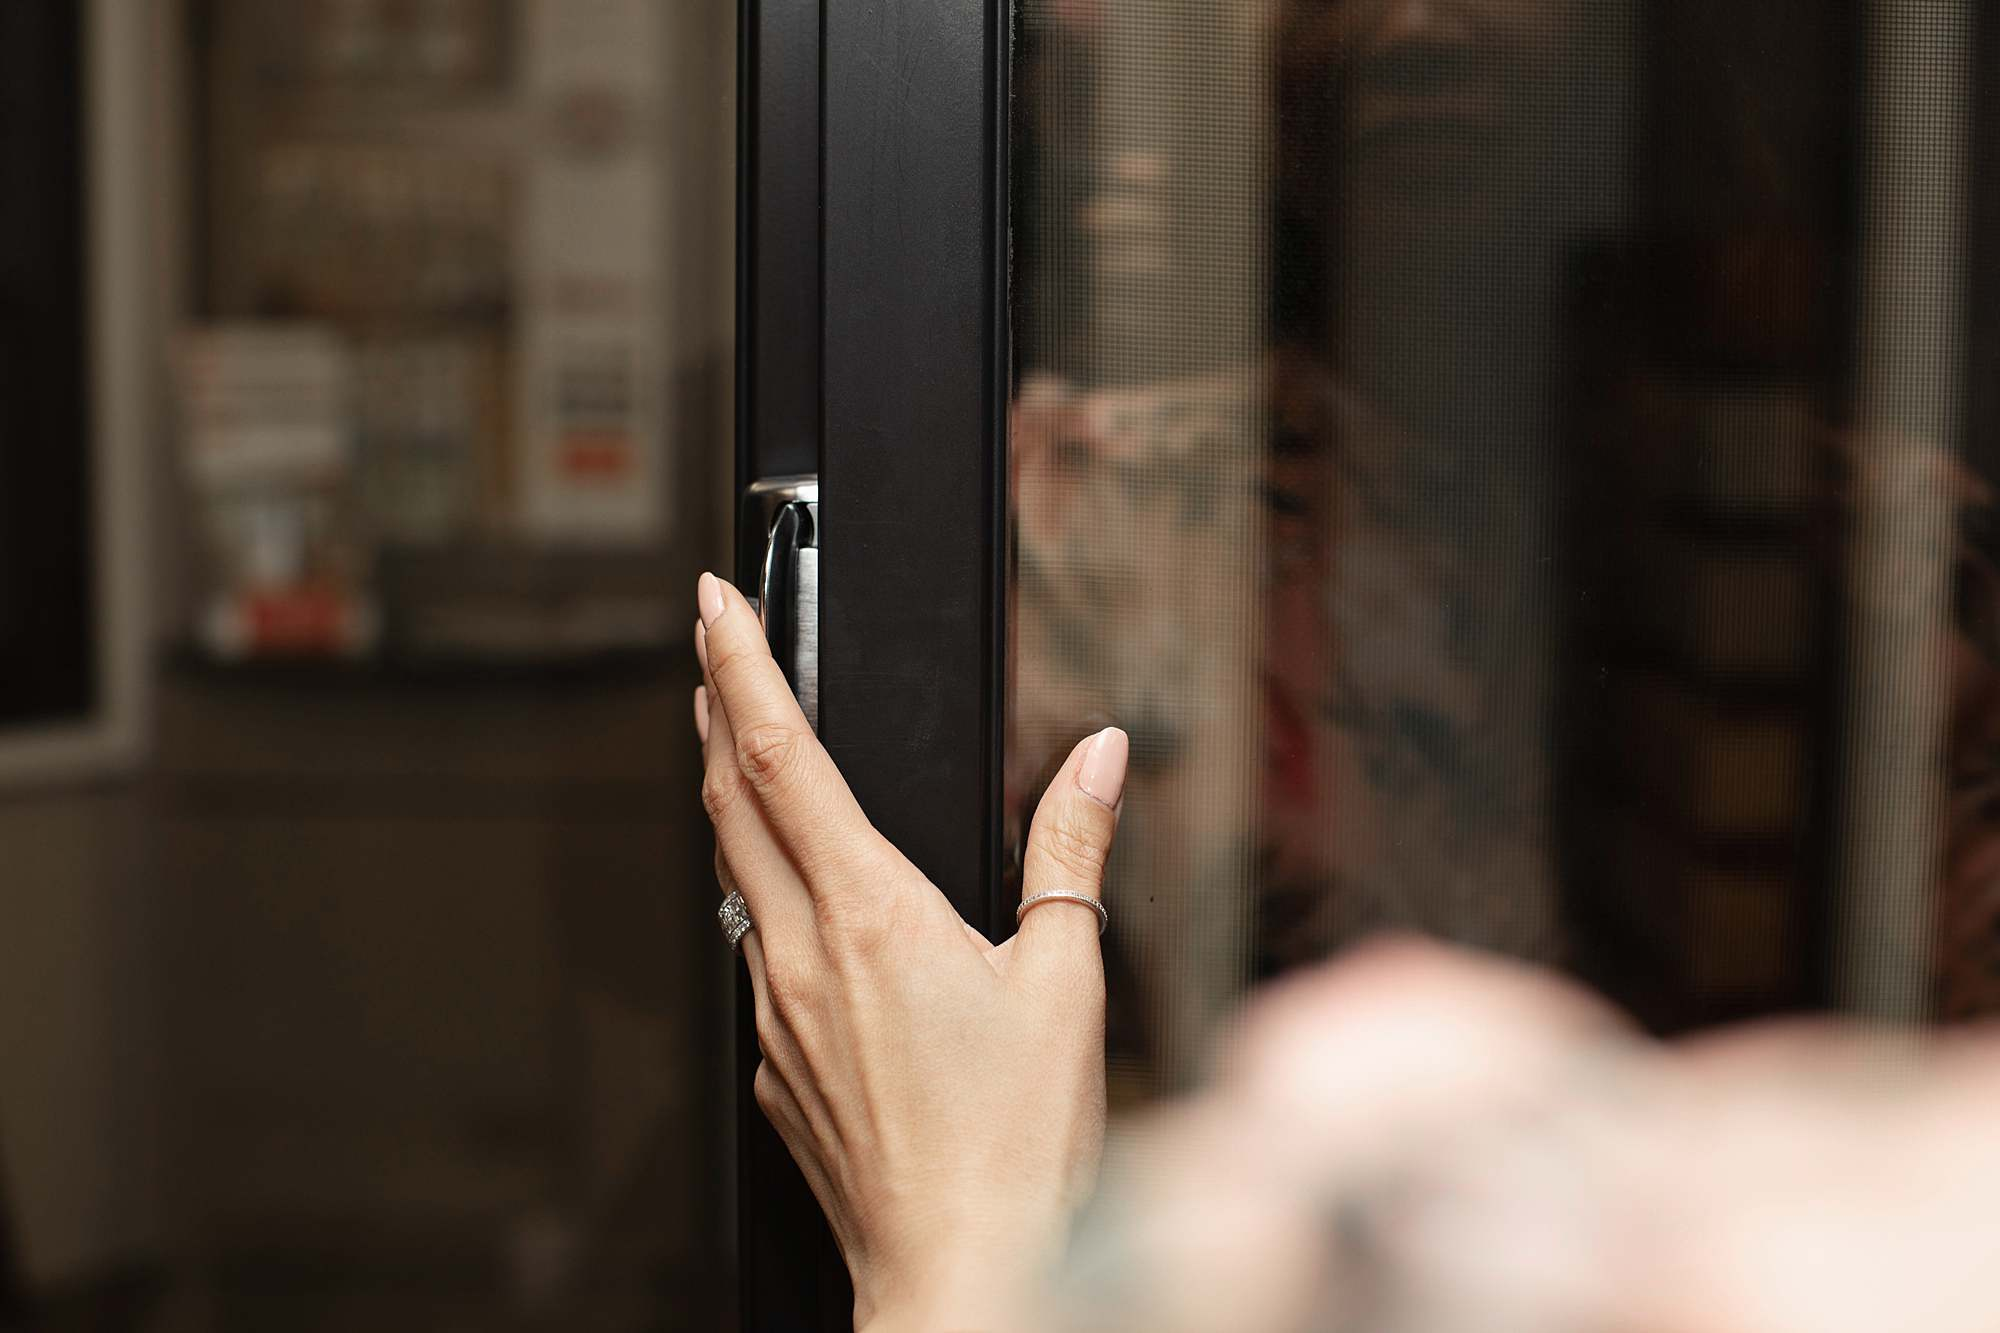 automatic locking window casement Milgard lifetime warranty best windows and doors